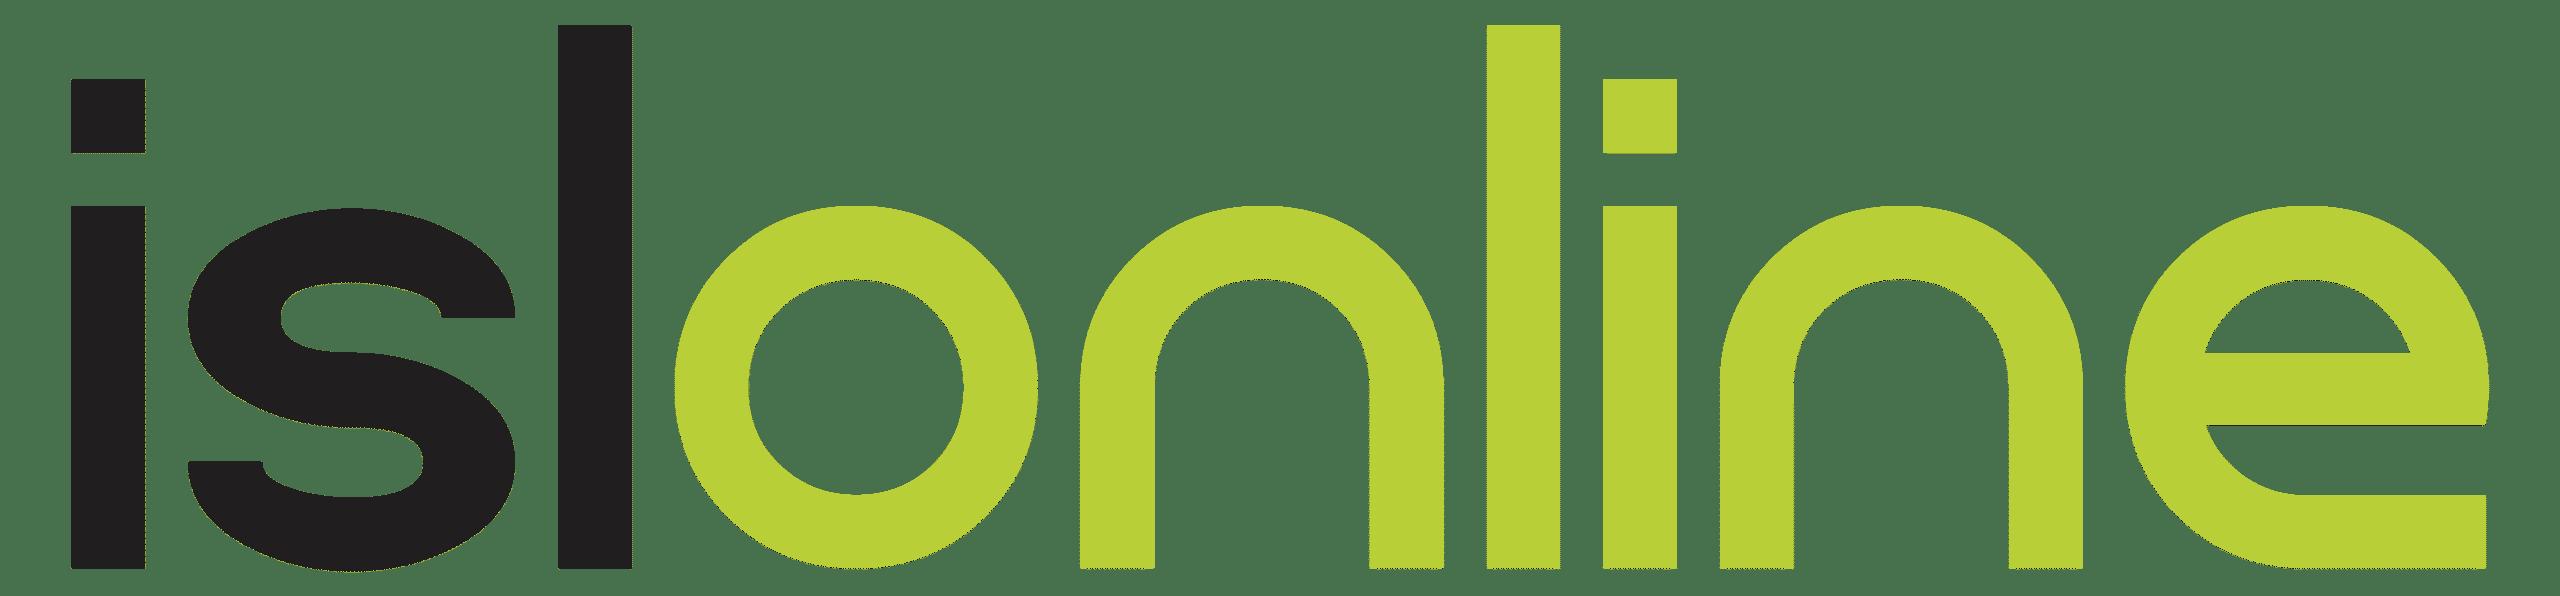 islonline-logo